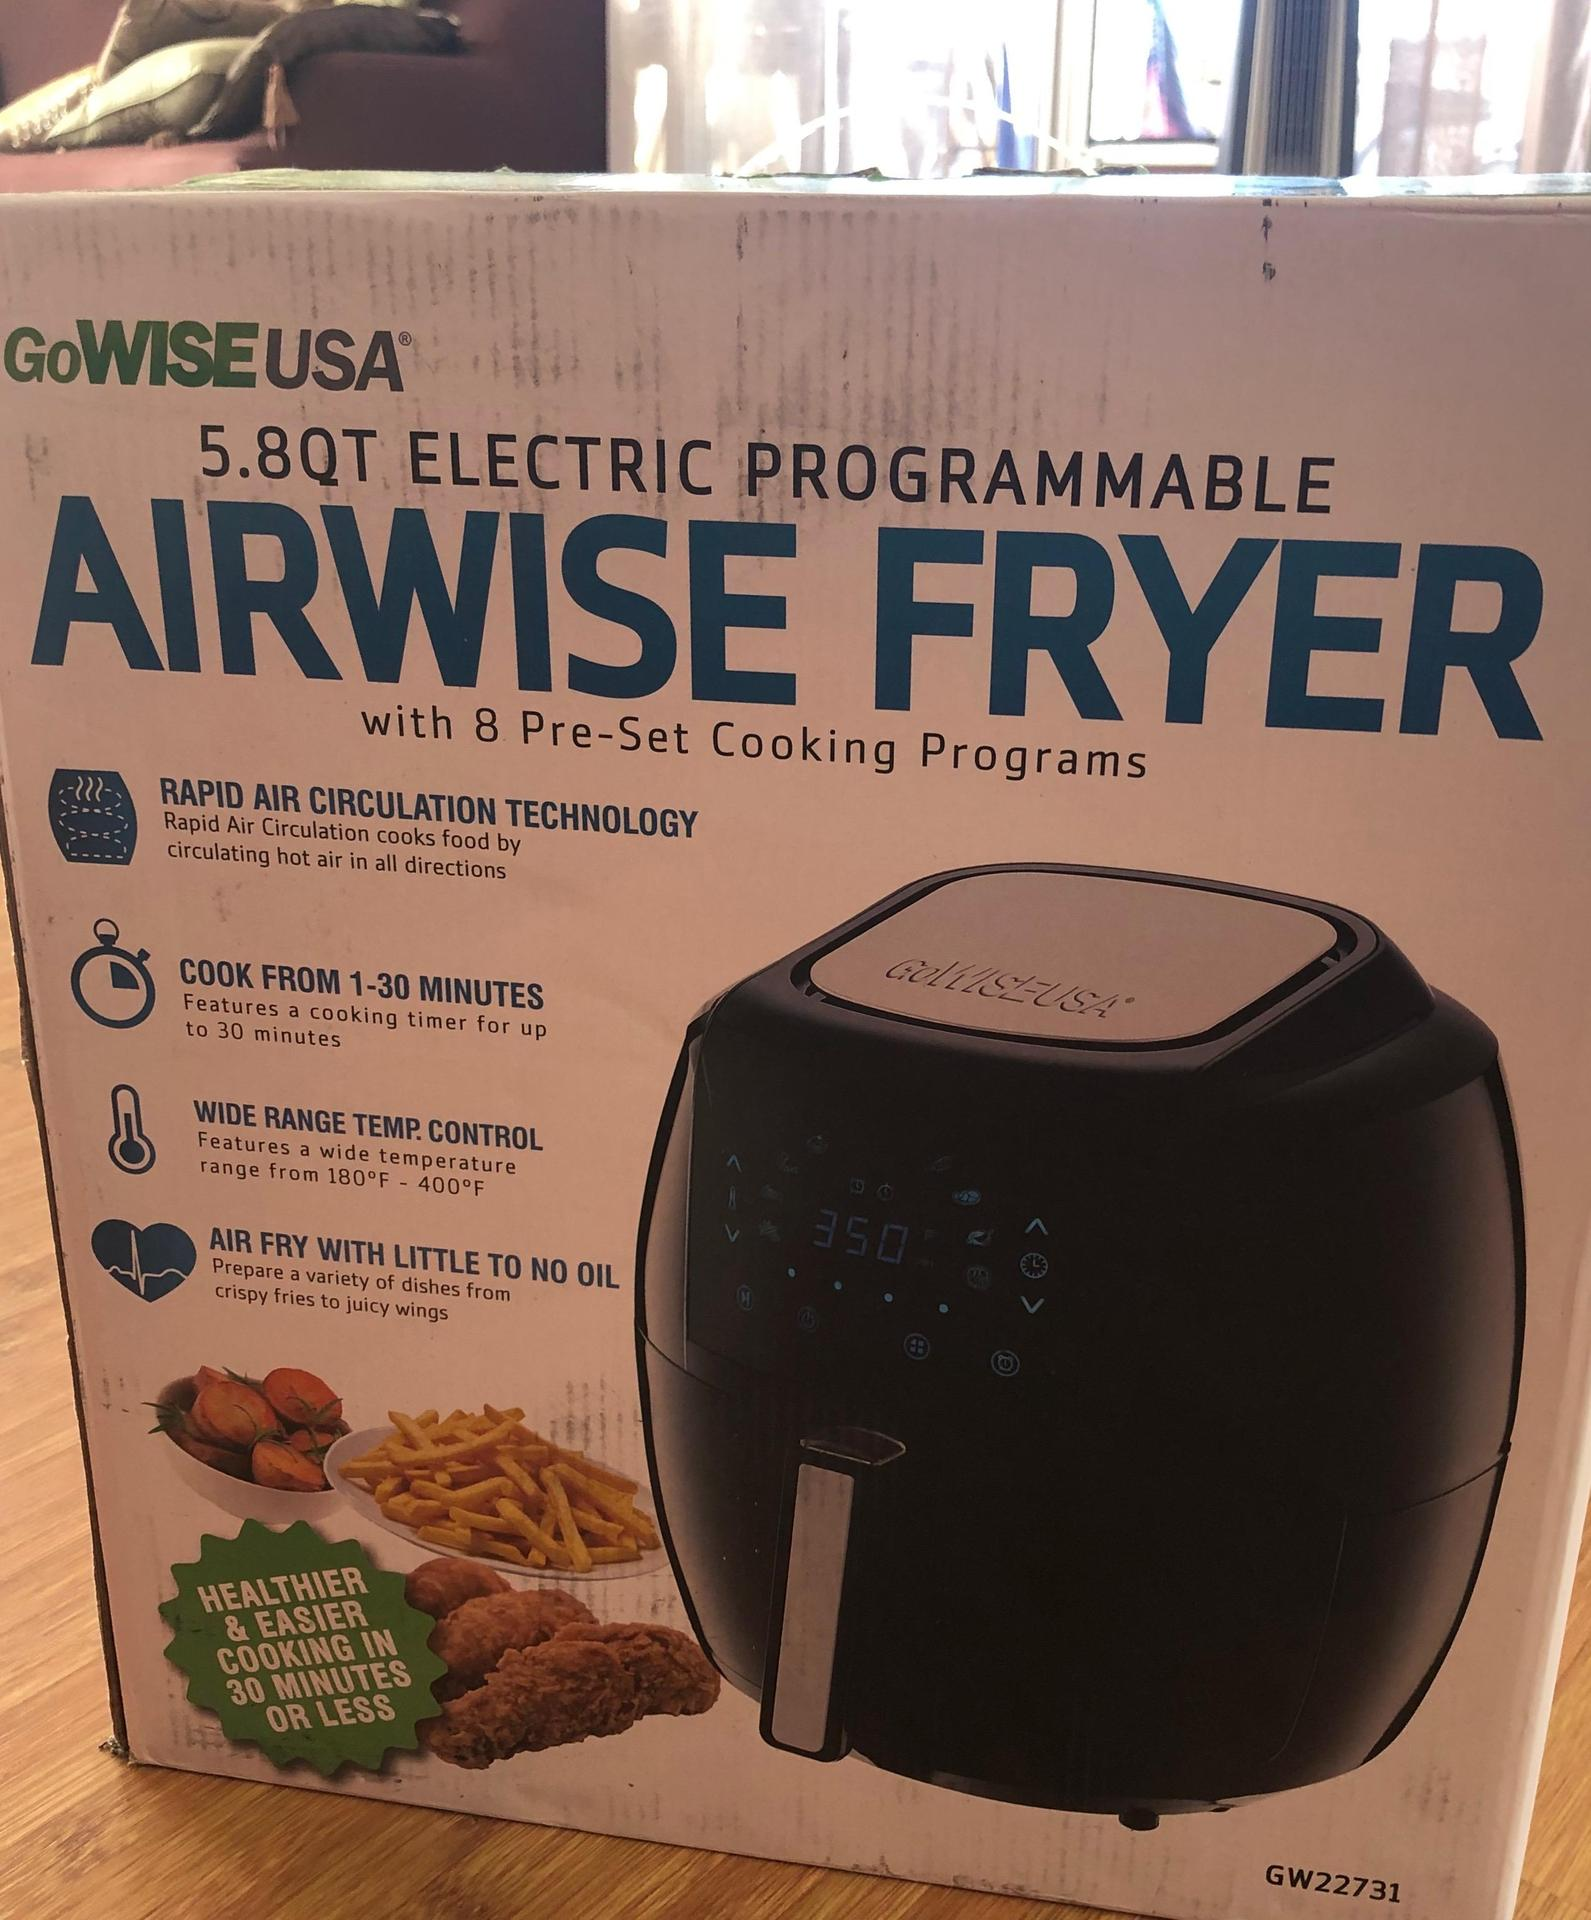 Air Wise Fryer